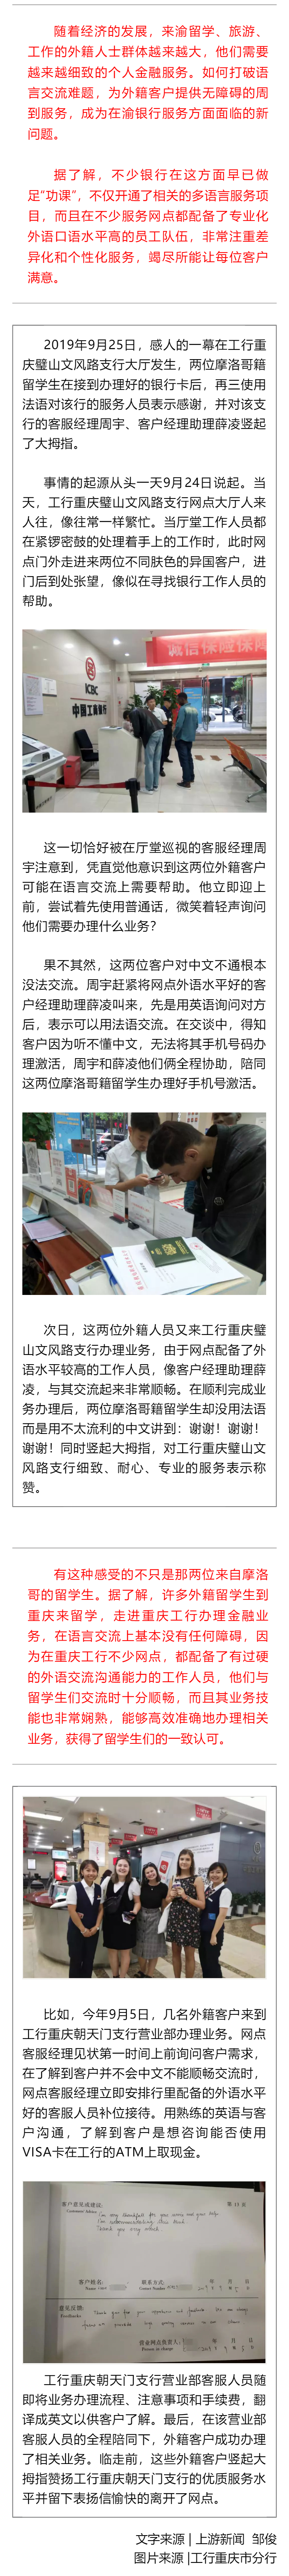 20191113_1749_yiban_screenshot.png